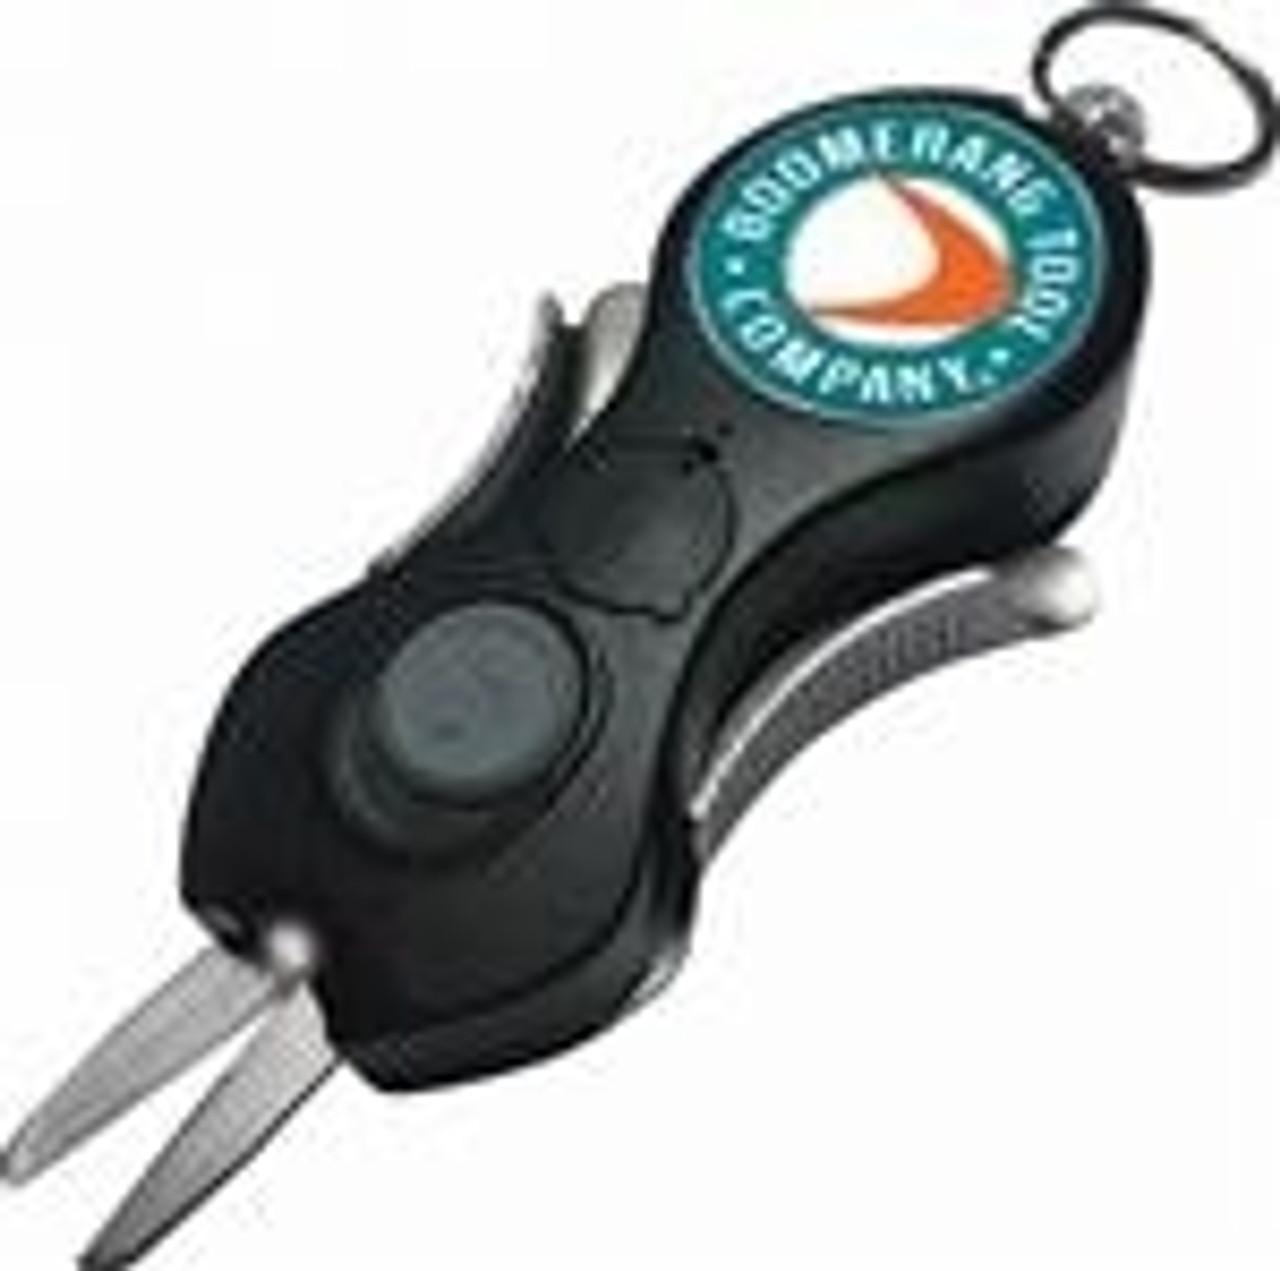 Boomerang Tool